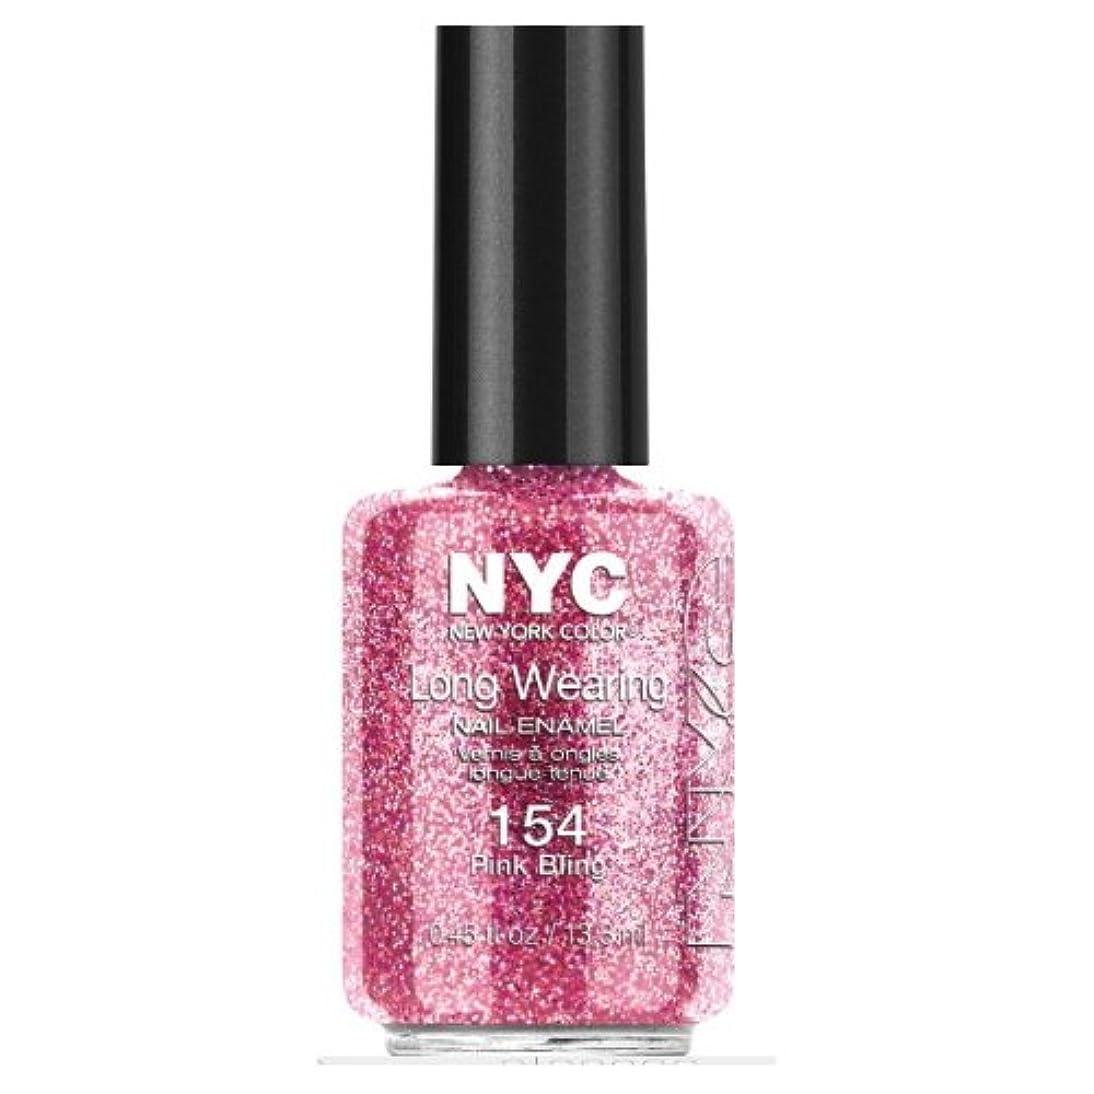 豚肉炭水化物図書館NYC Long Wearing Nail Enamel - Pink Bling (並行輸入品)